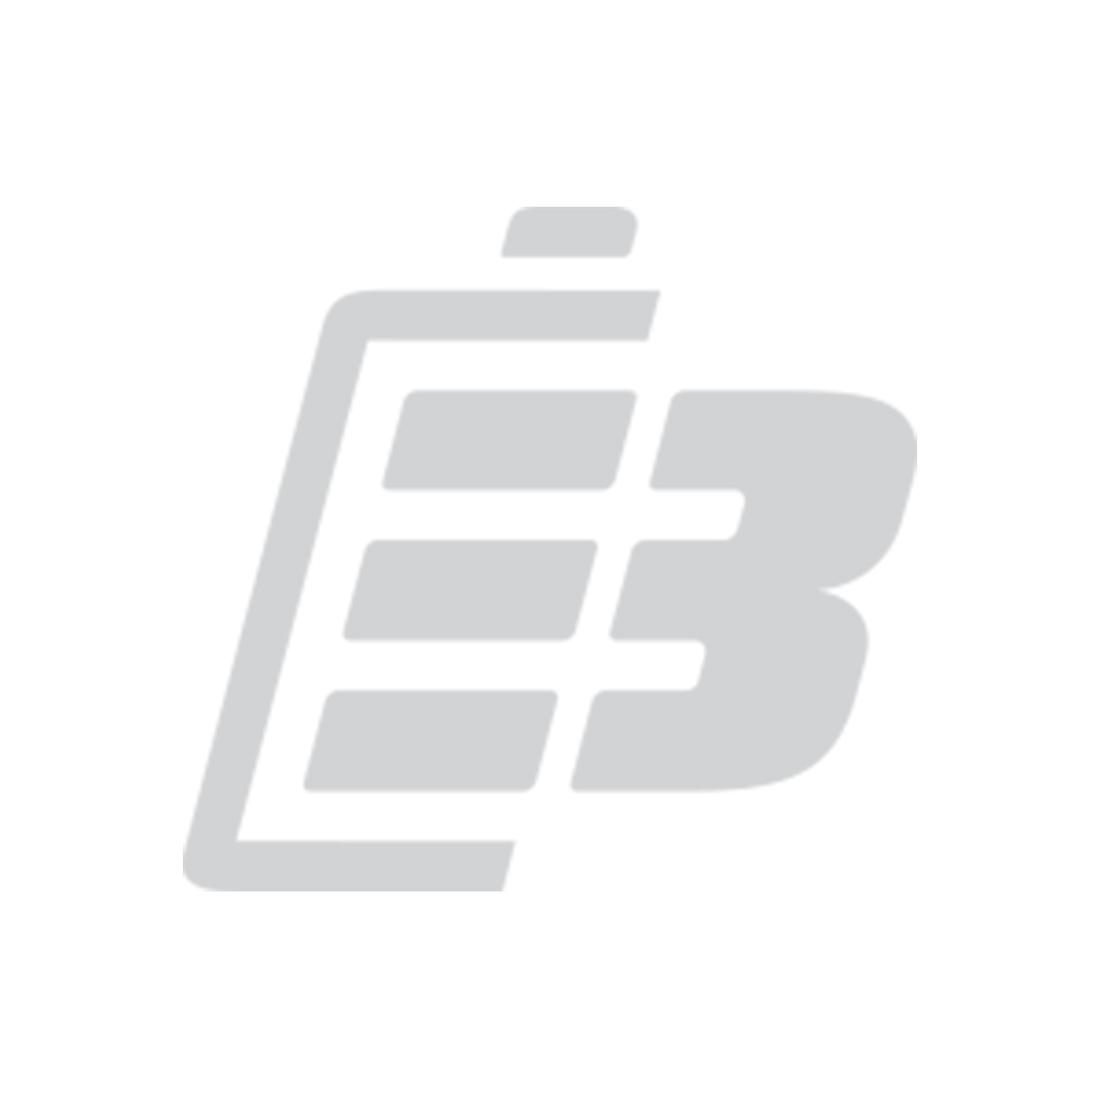 Smartphone battery ZTE Blade A460_1